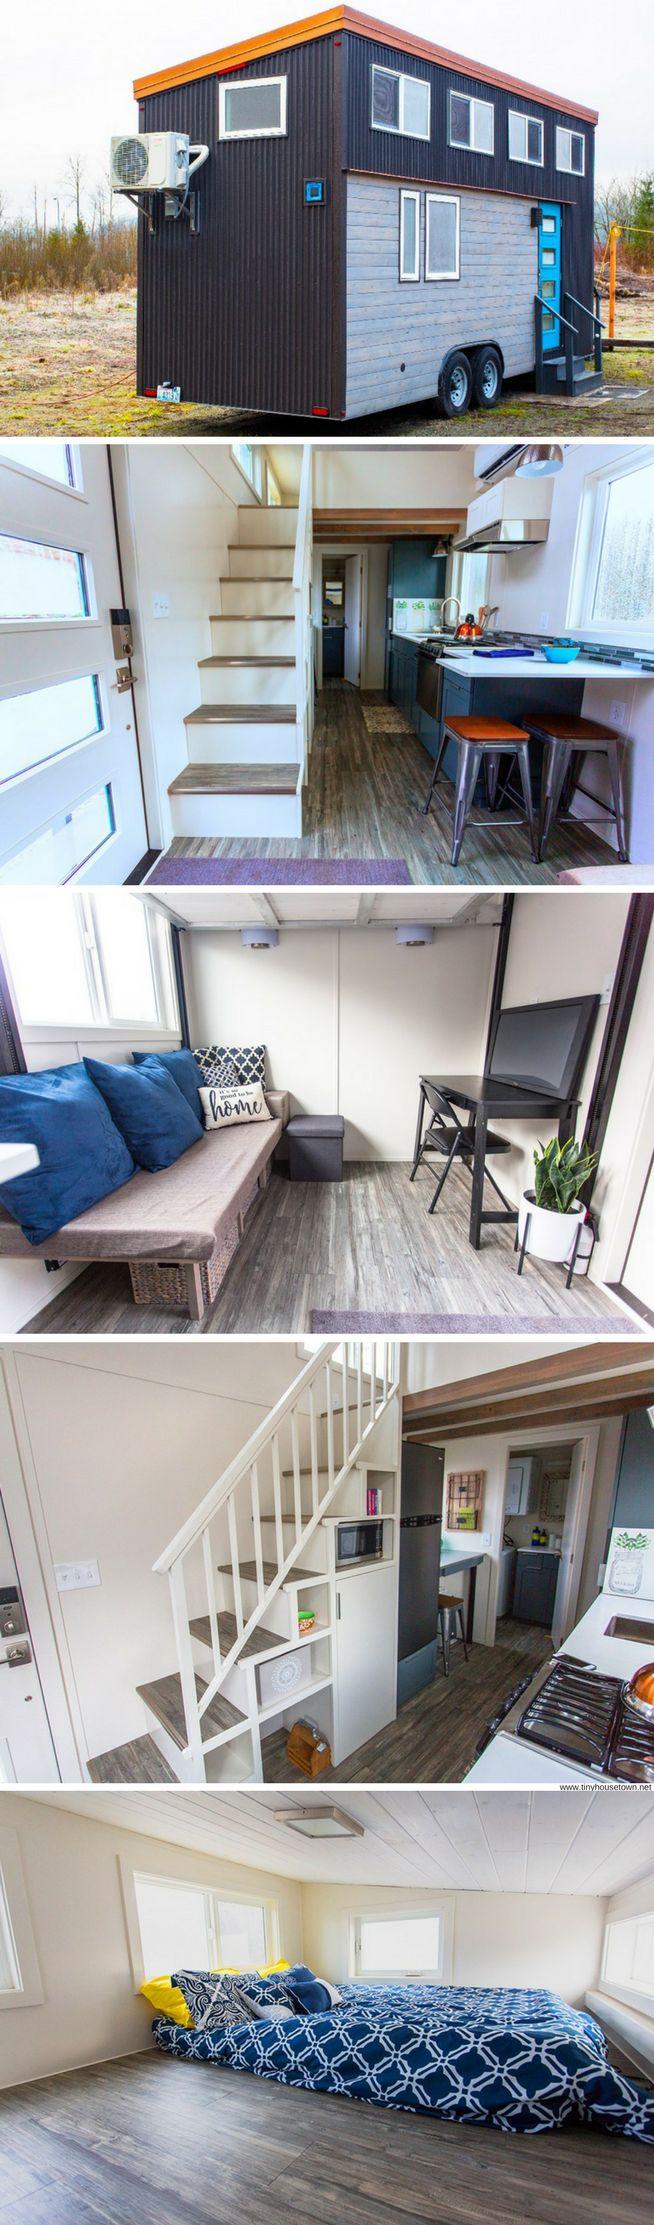 The Alki Enhanced tiny house (275 Sq Ft)